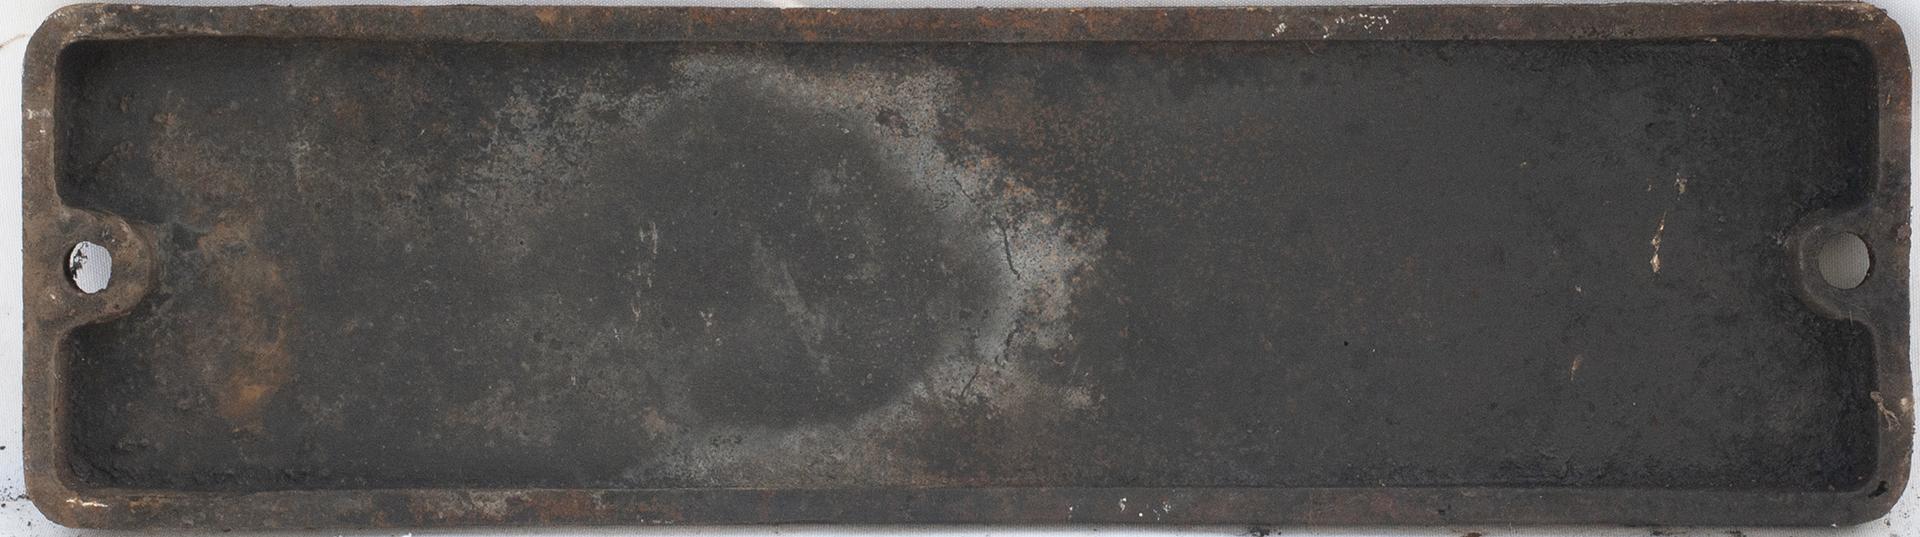 Smokebox Numberplate 73164 Ex Riddles Std Class 5